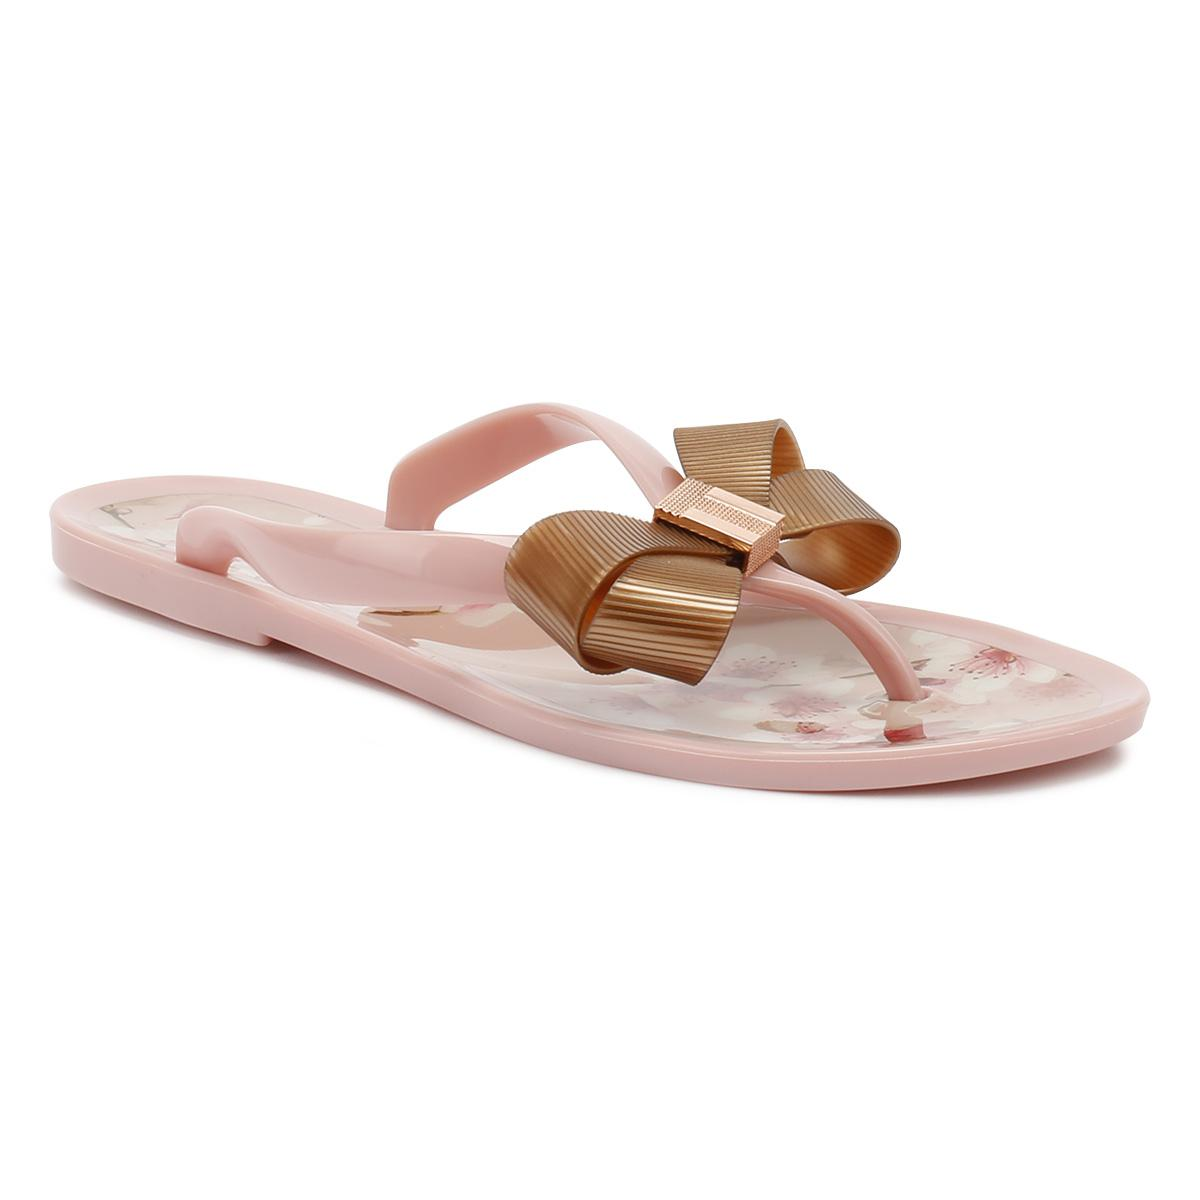 ea8f173c8 Ted Baker Womens Blossom Pink Susziep Flip Flops in Pink - Lyst